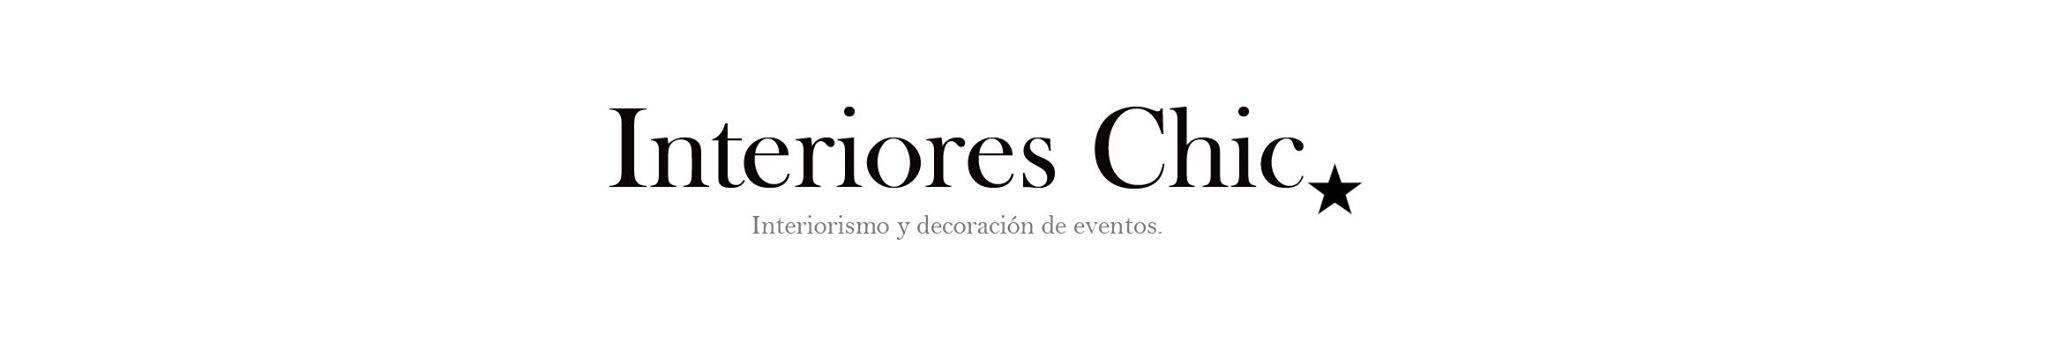 Interiores chic blog de decoraci n n rdica blog de for Decoracion de interiores logo